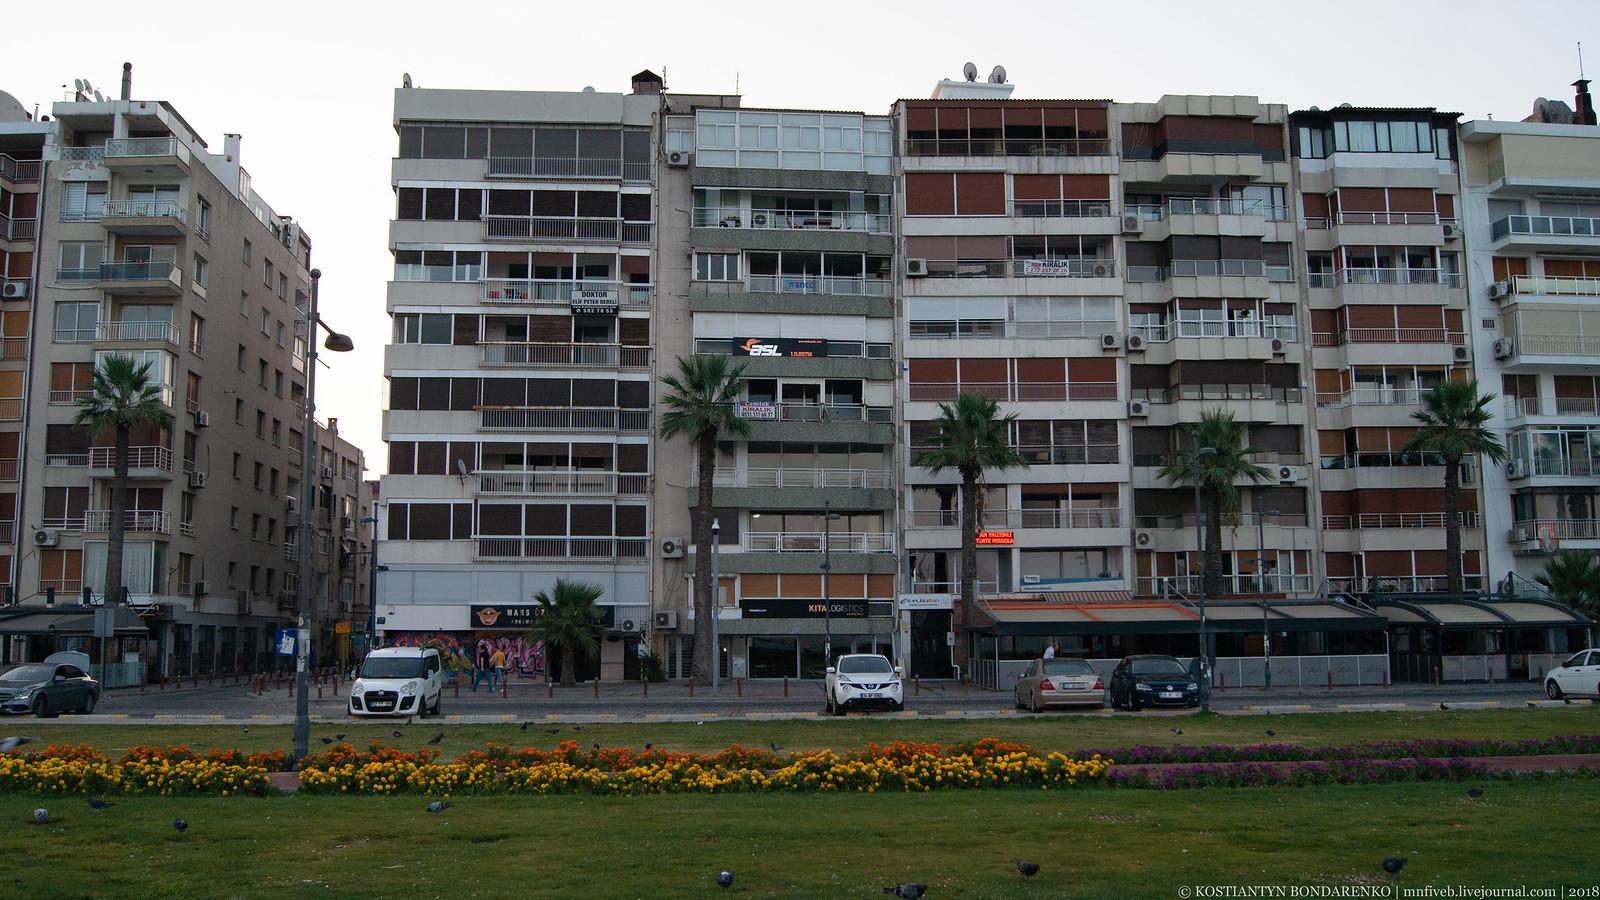 20180821 - Izmir-05